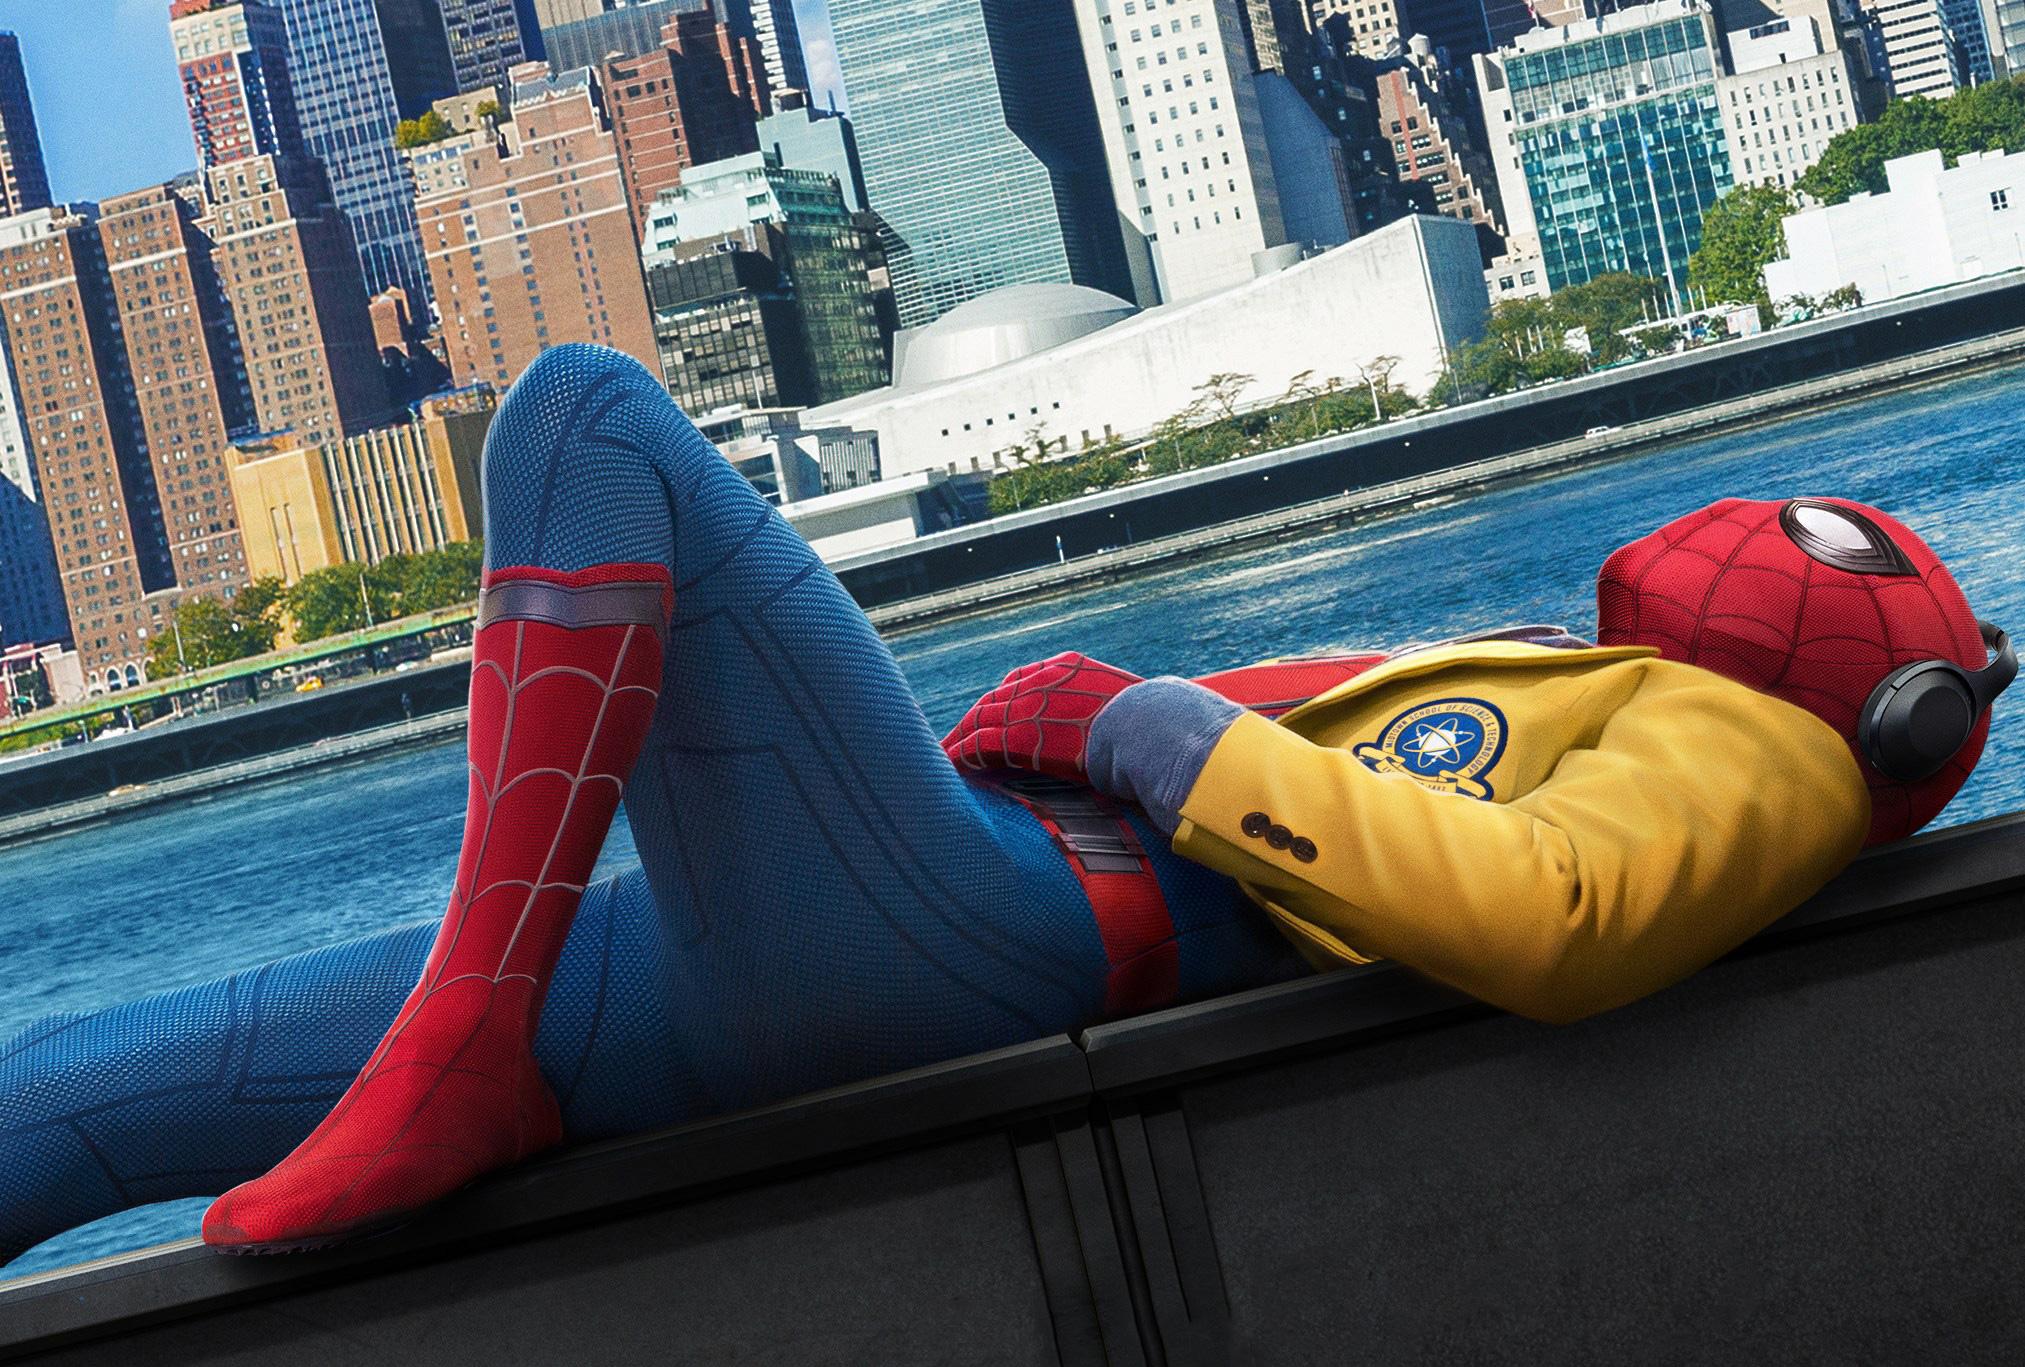 spider-man-homecoming-4k-wallpaper-1